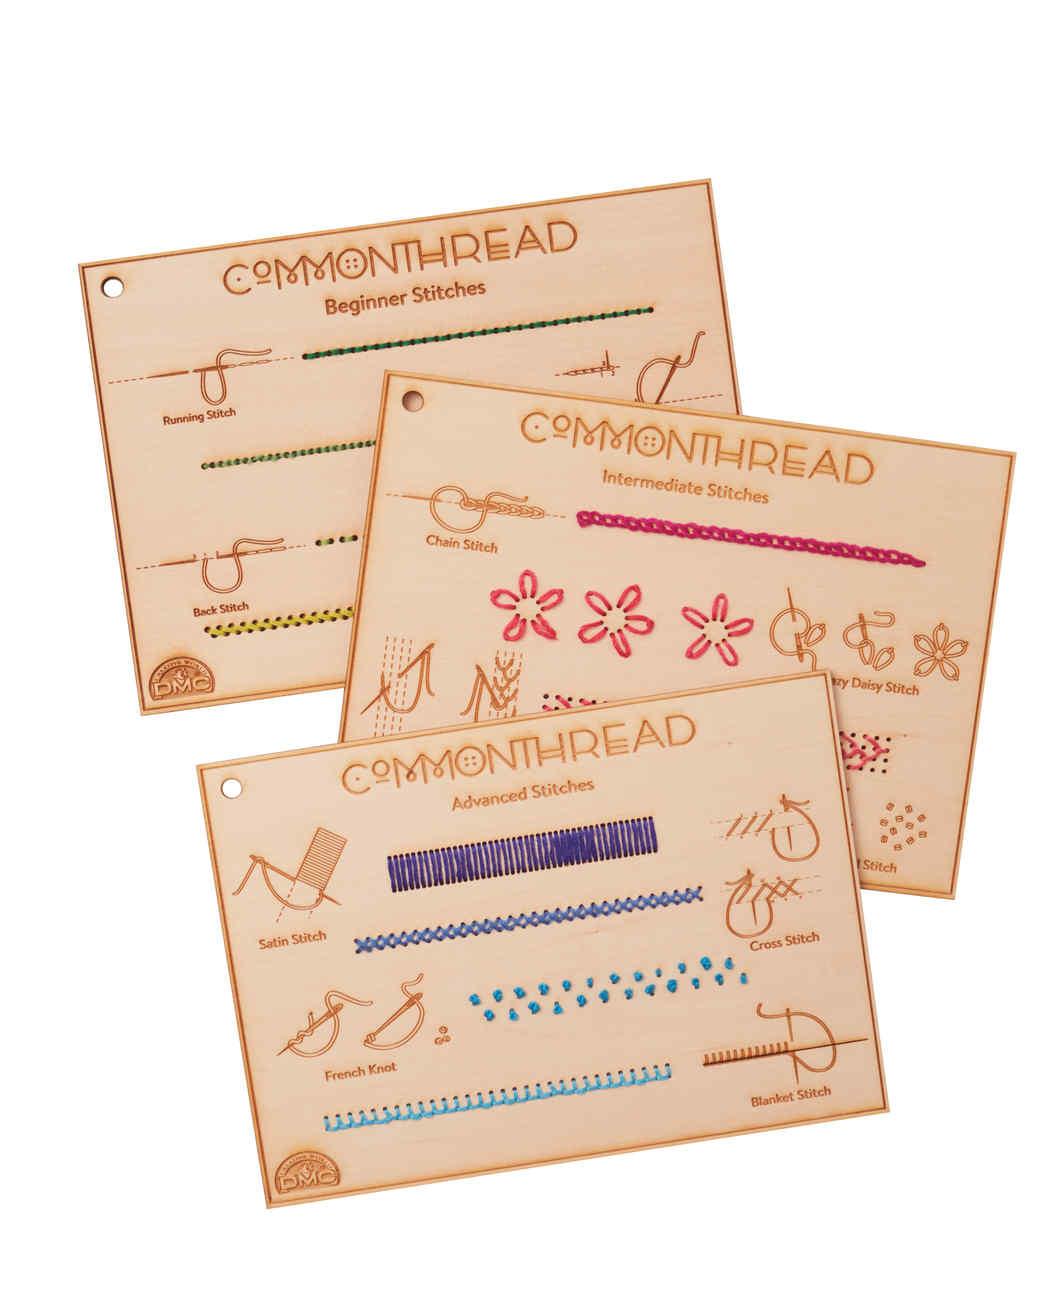 common-thread-sewingch-kit-237-d112519.jpg